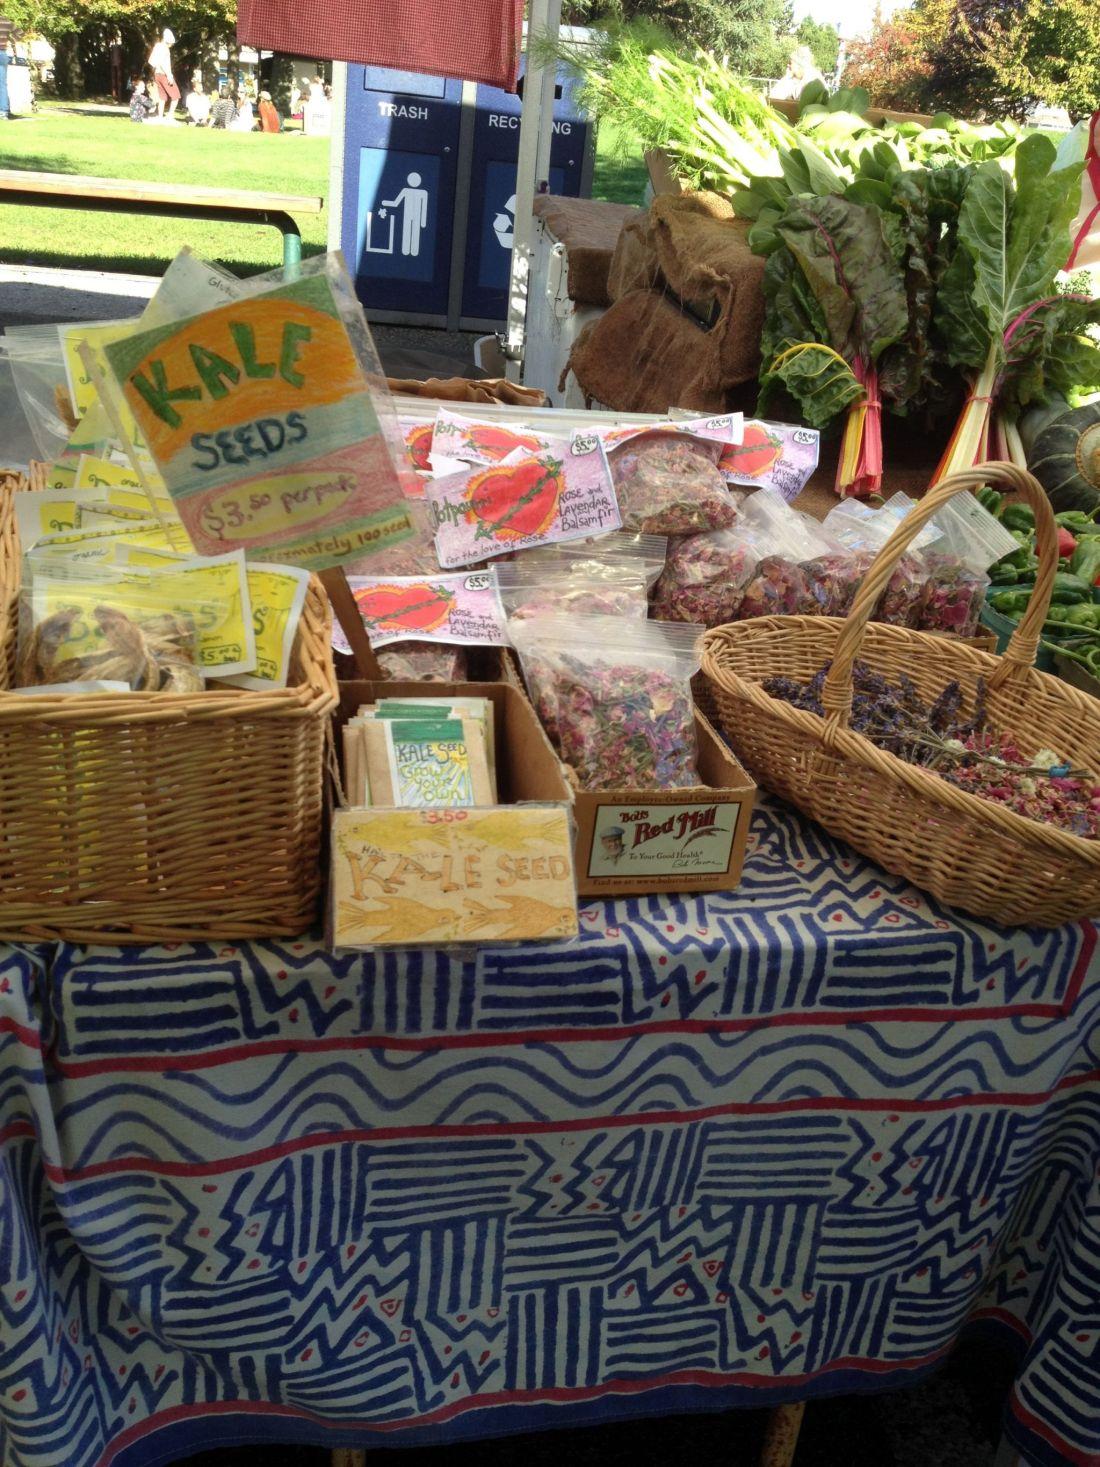 Fresh organic produce at Salt Spring Island Saturday market, British Columbia